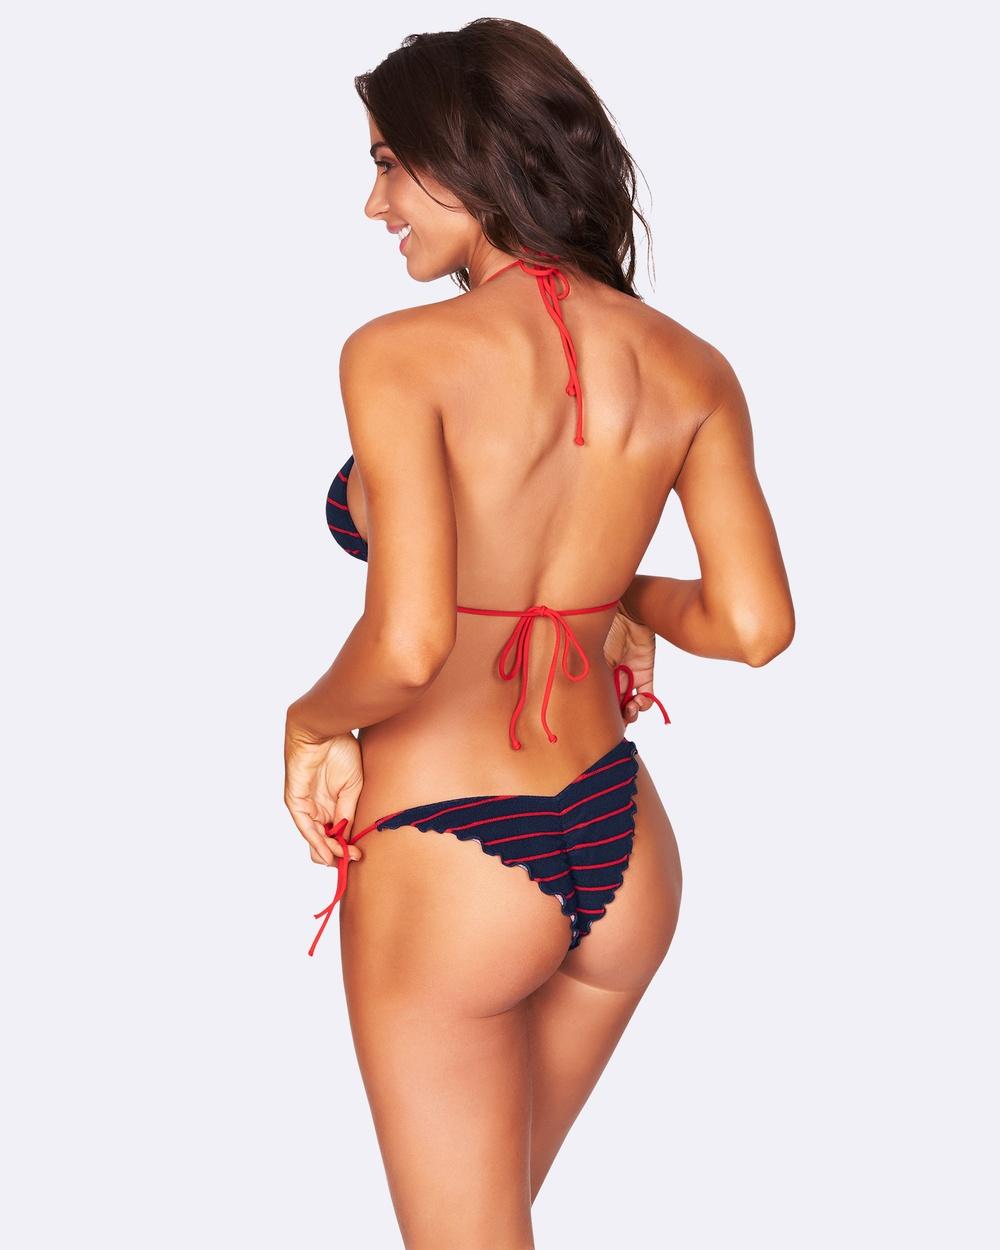 Bond-Eye Swimwear Ginger Tie Side Terry Briefs Bikini Bottoms Navy/Red Ginger Tie Side Terry Briefs